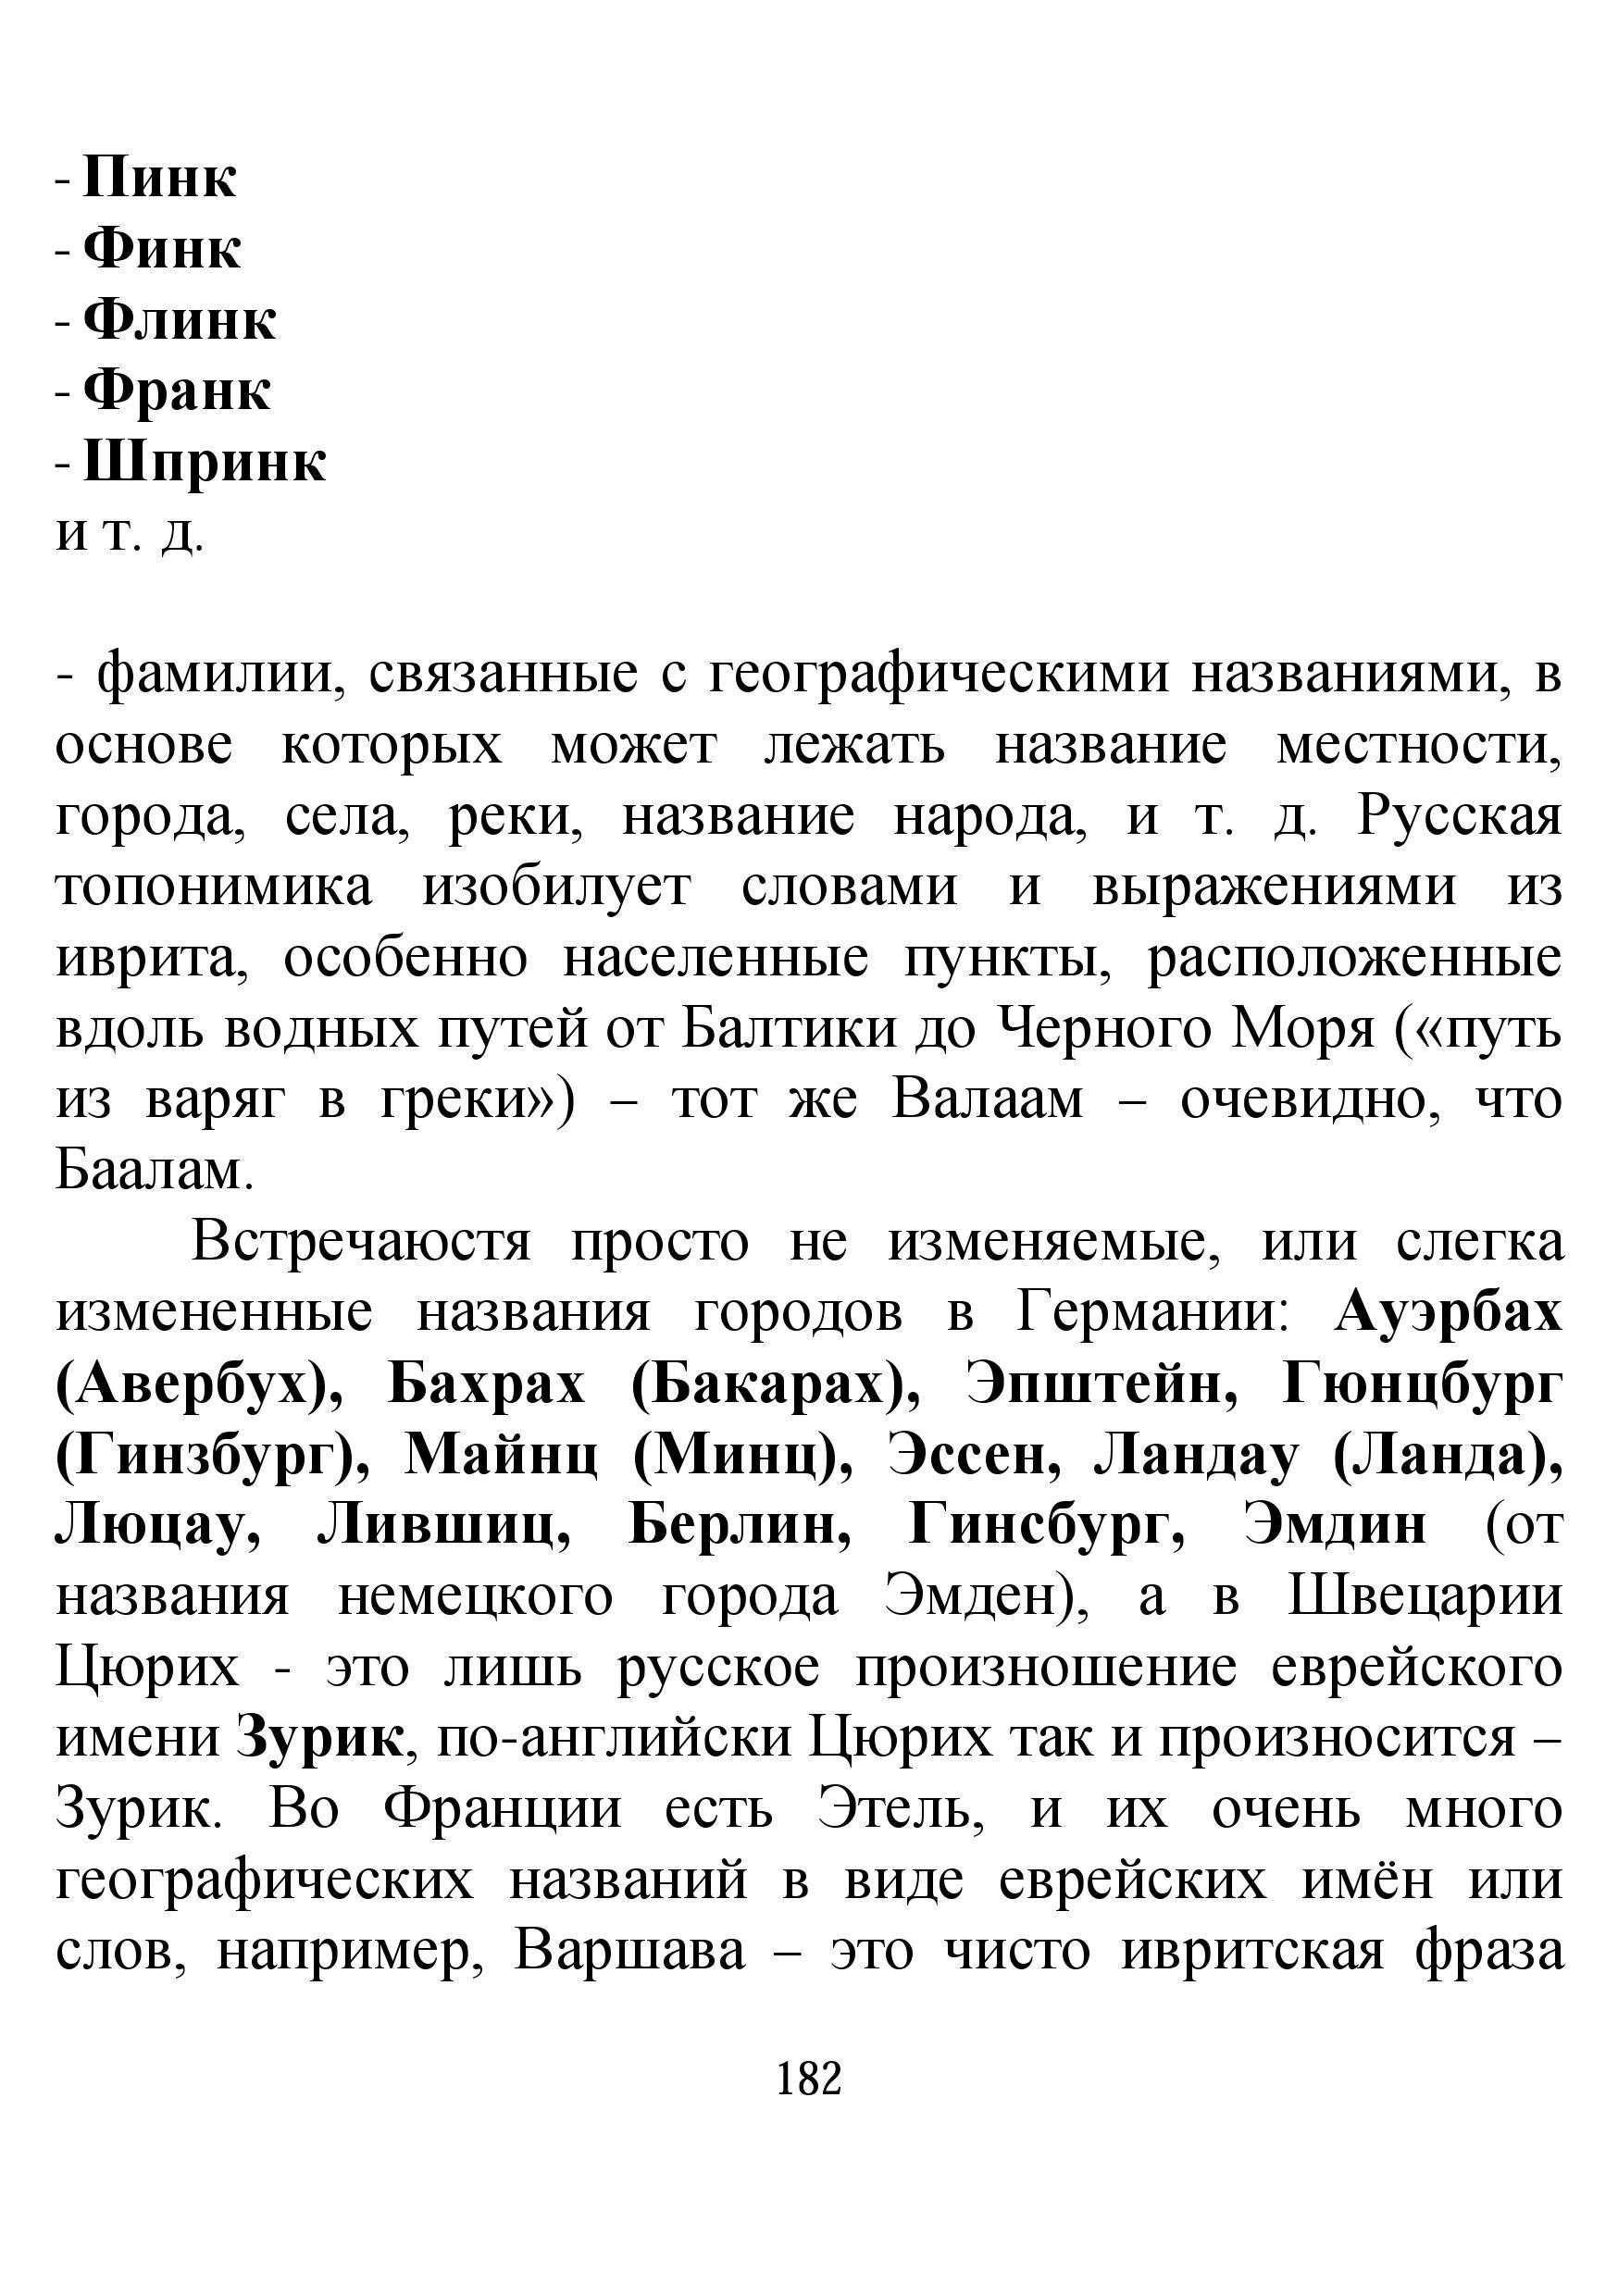 http://s0.uploads.ru/YK90m.jpg